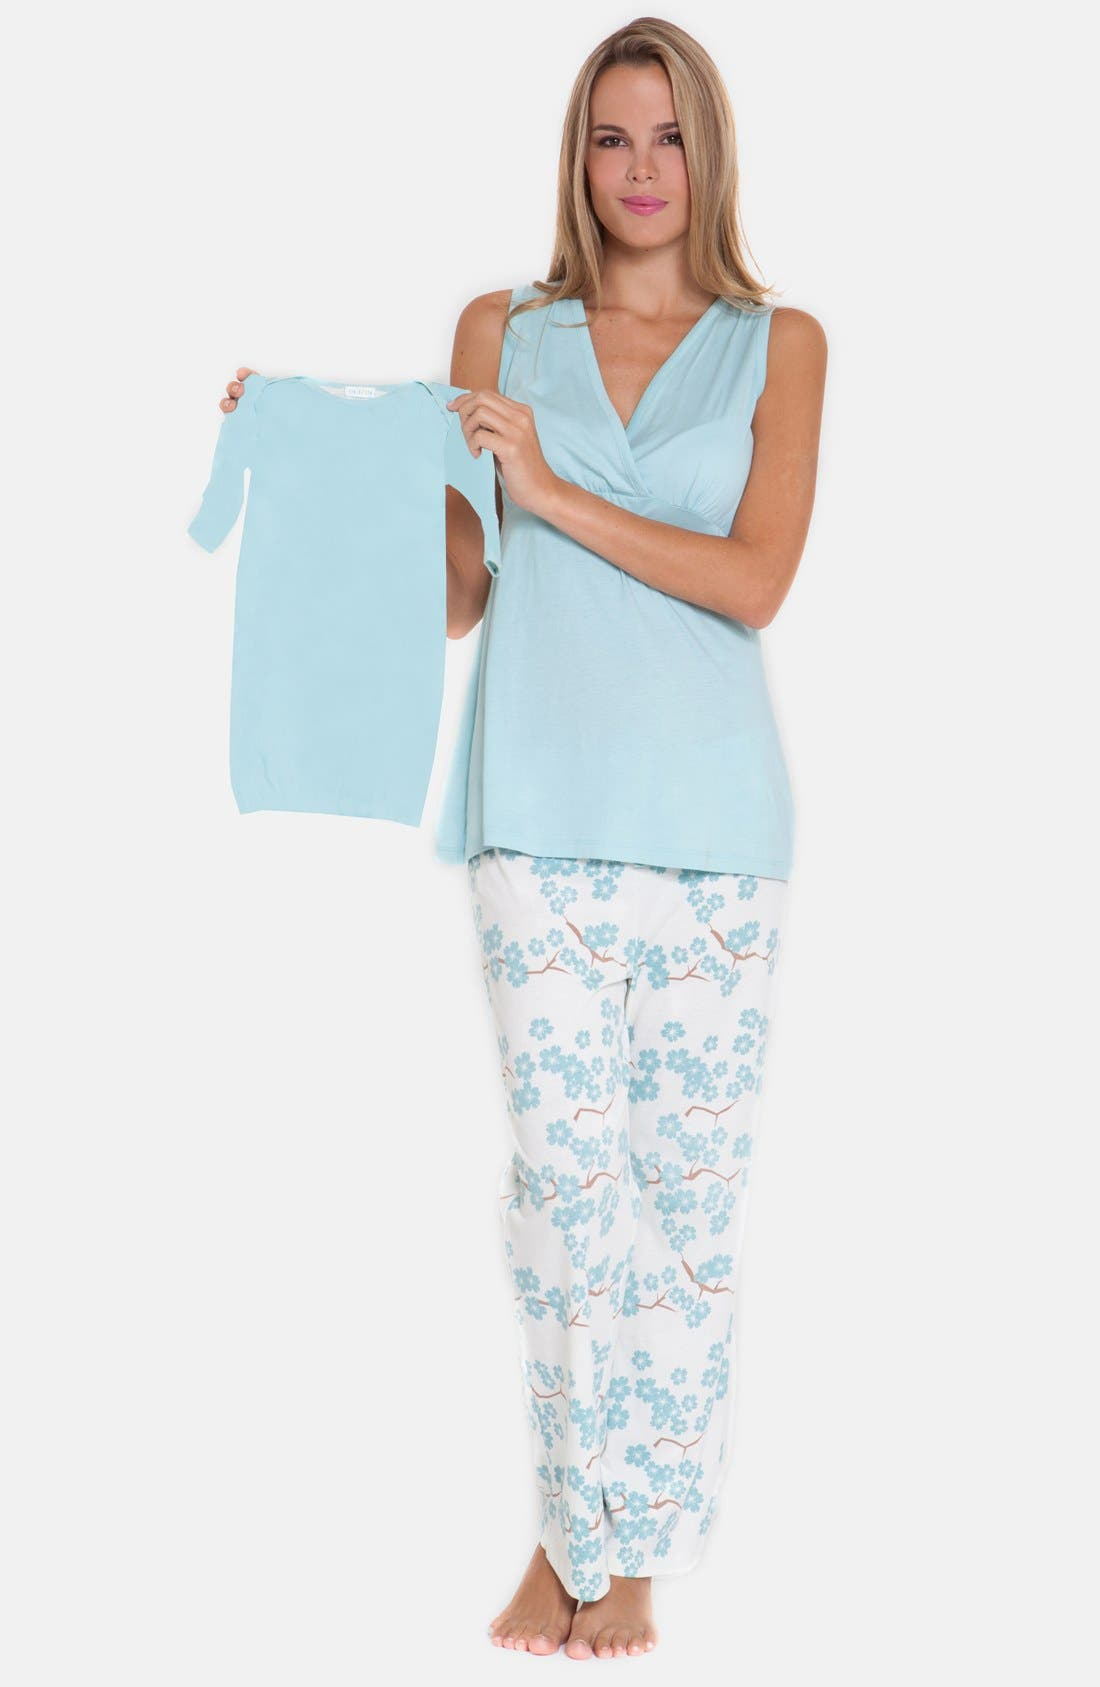 4-Piece Maternity Sleepwear Gift Set,                             Main thumbnail 2, color,